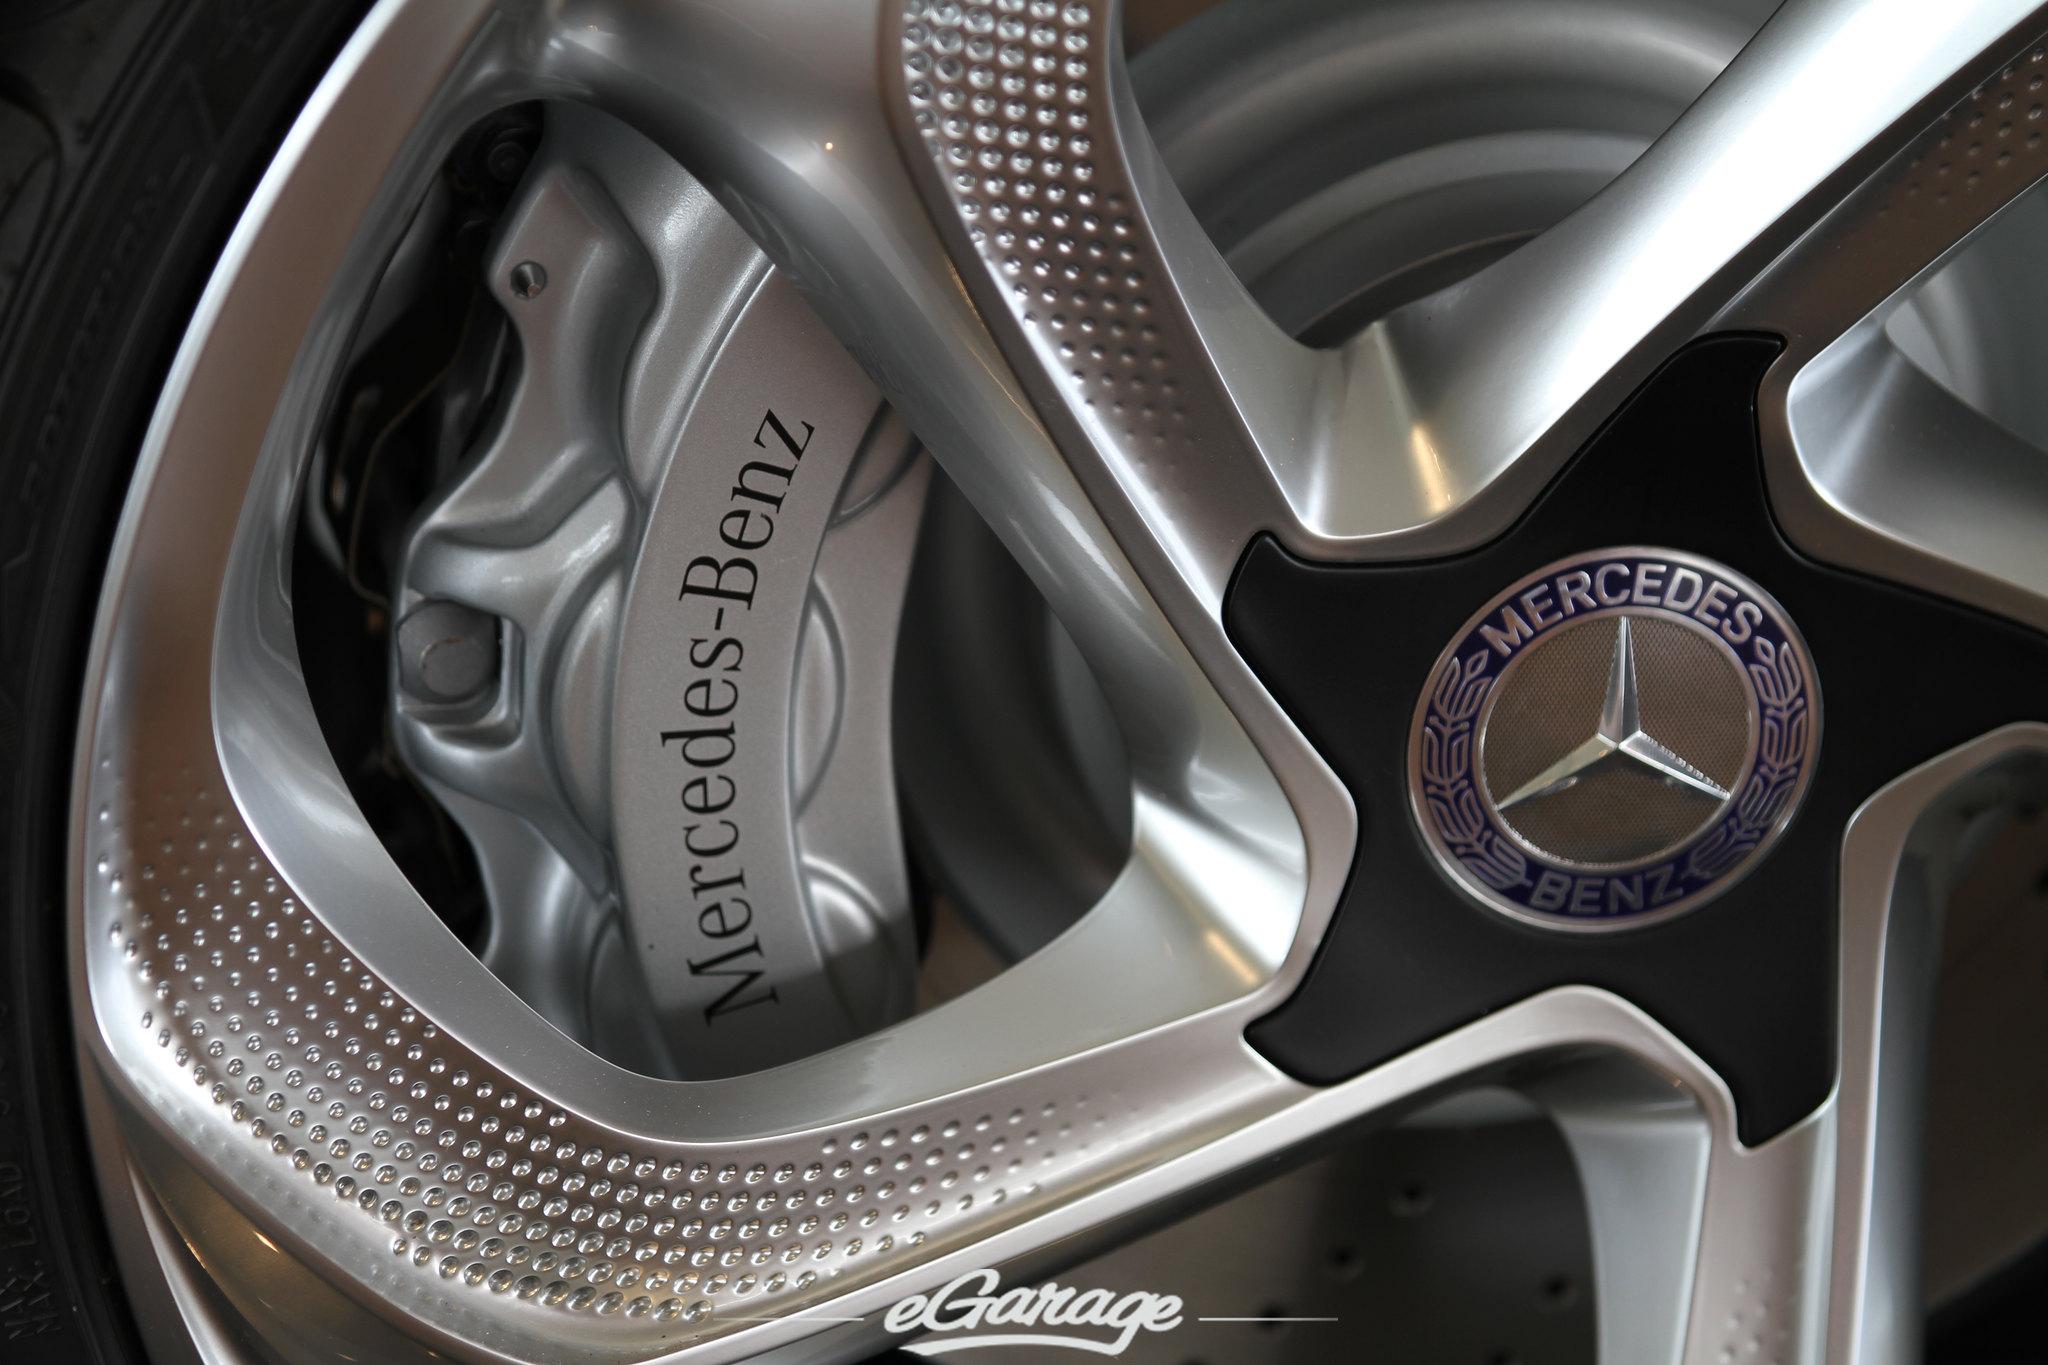 7828695042 25e9edce50 k Mercedes Benz Classic